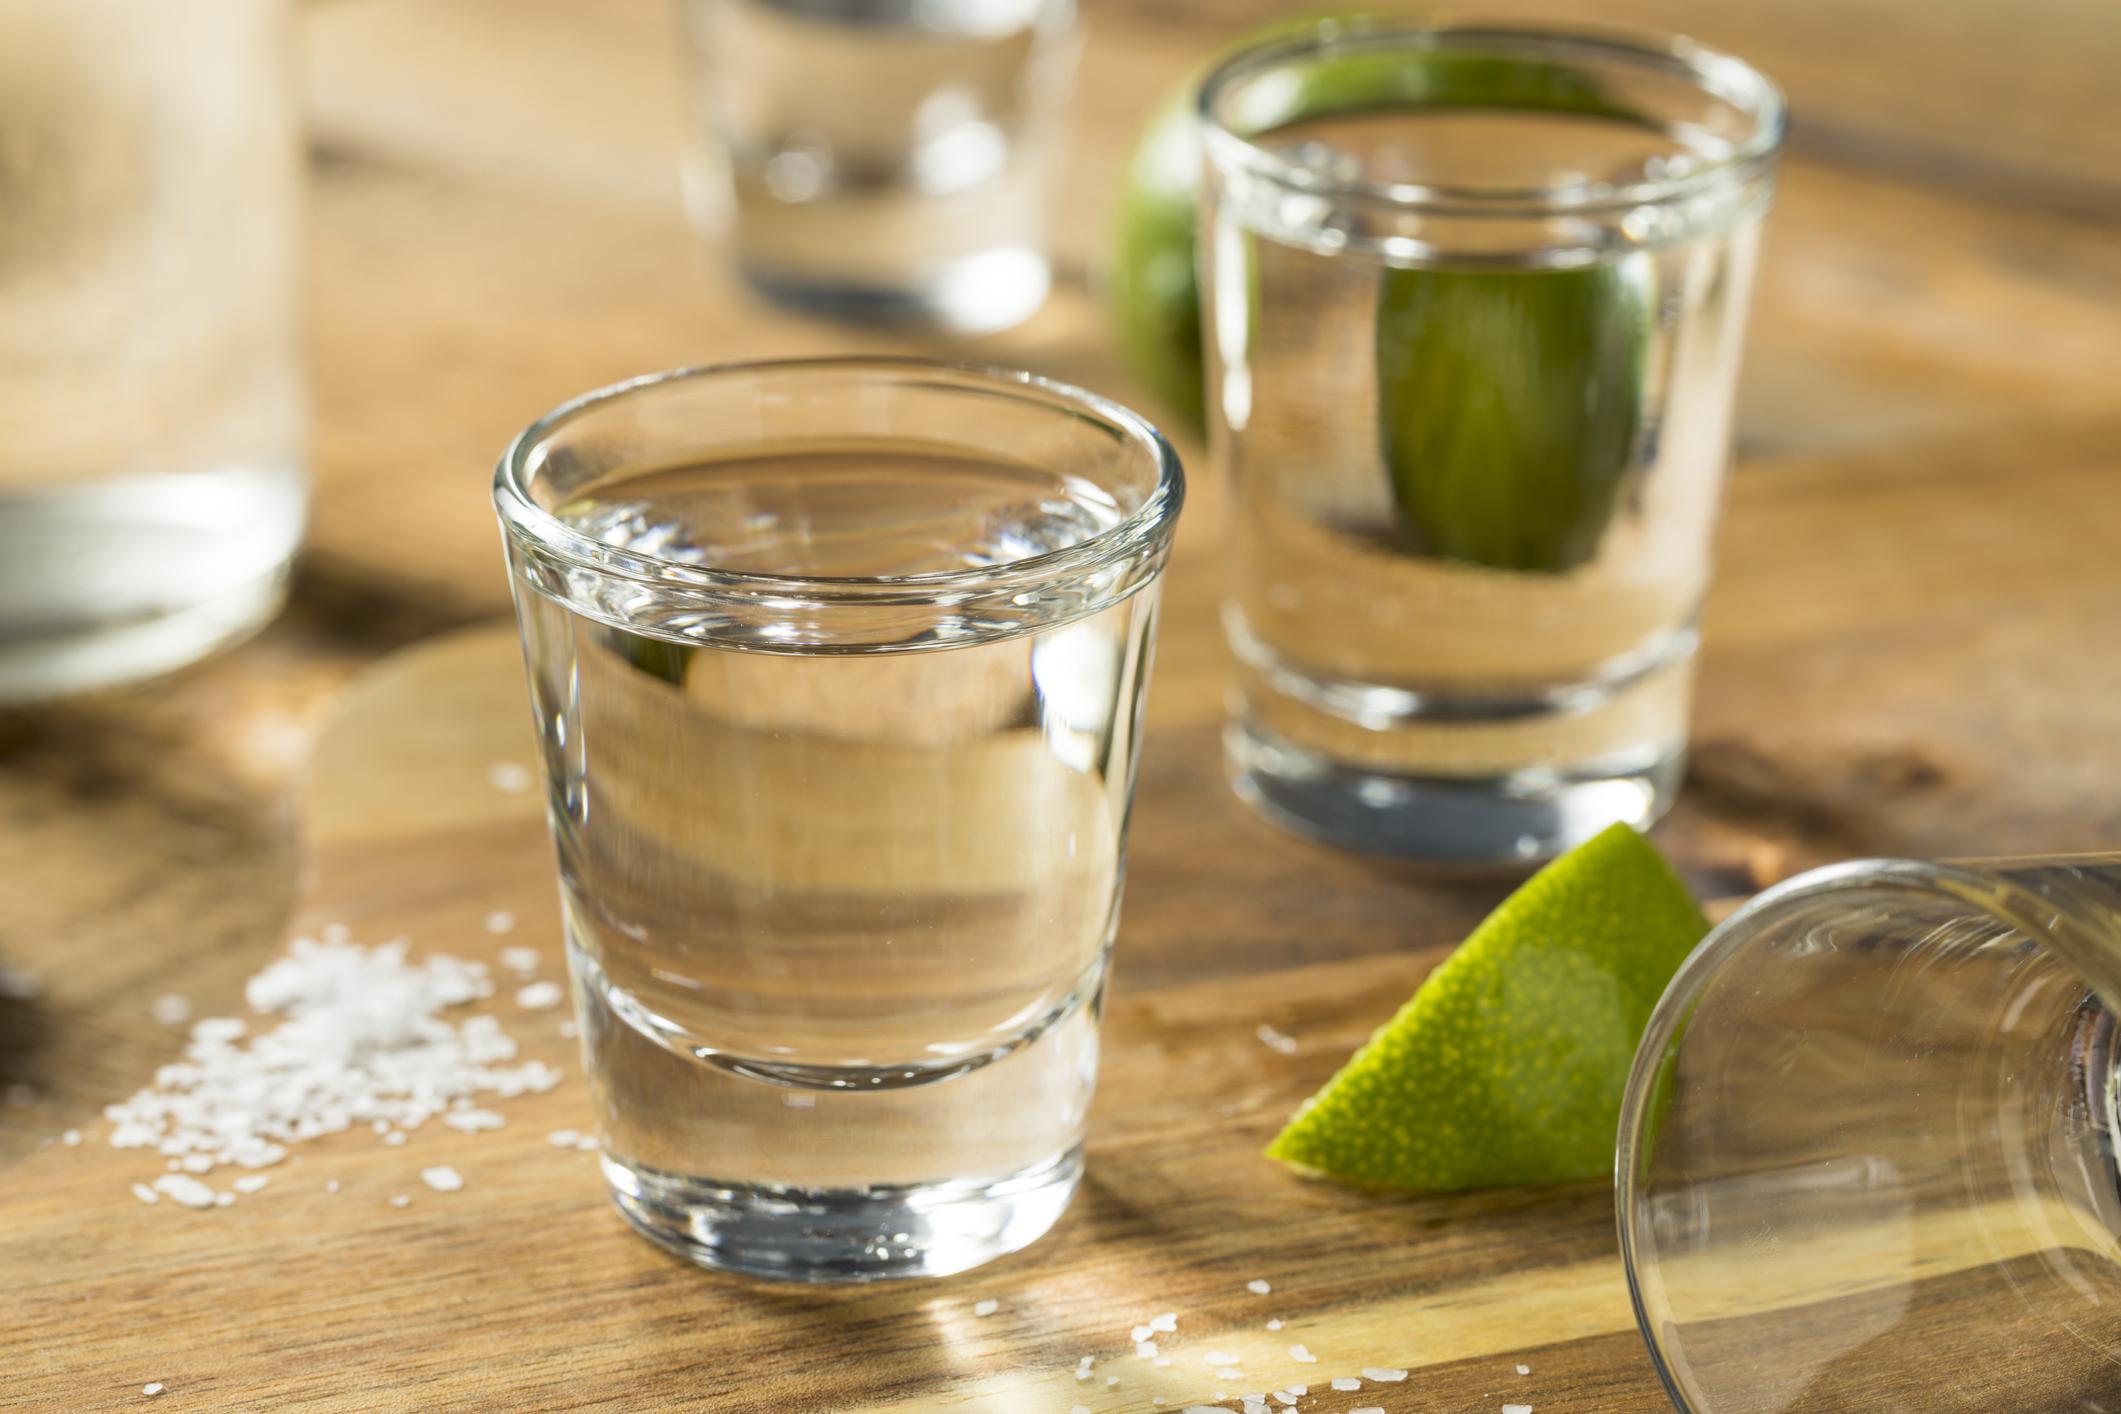 Pernod Ricard Forms Partnership With Super-premium Mezcal Ojo De Tigre photo